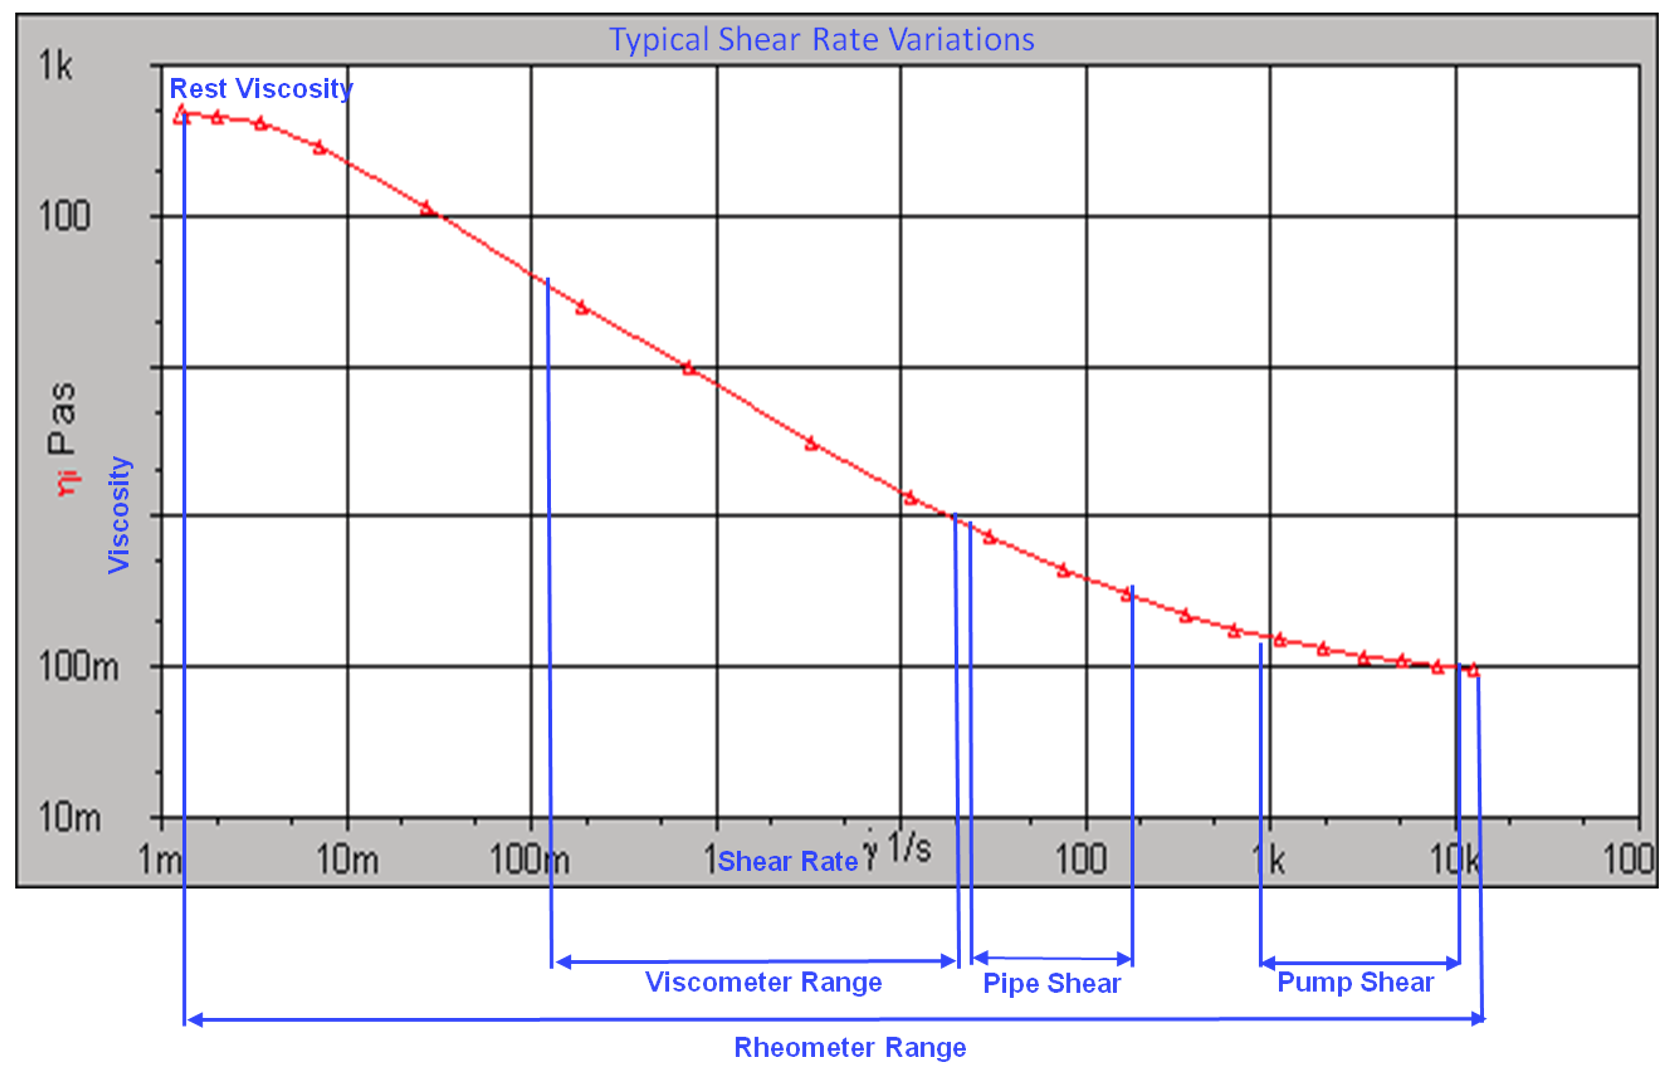 newtonian-non-newtonian-fluids-viscosity-and-pump-shear-curve